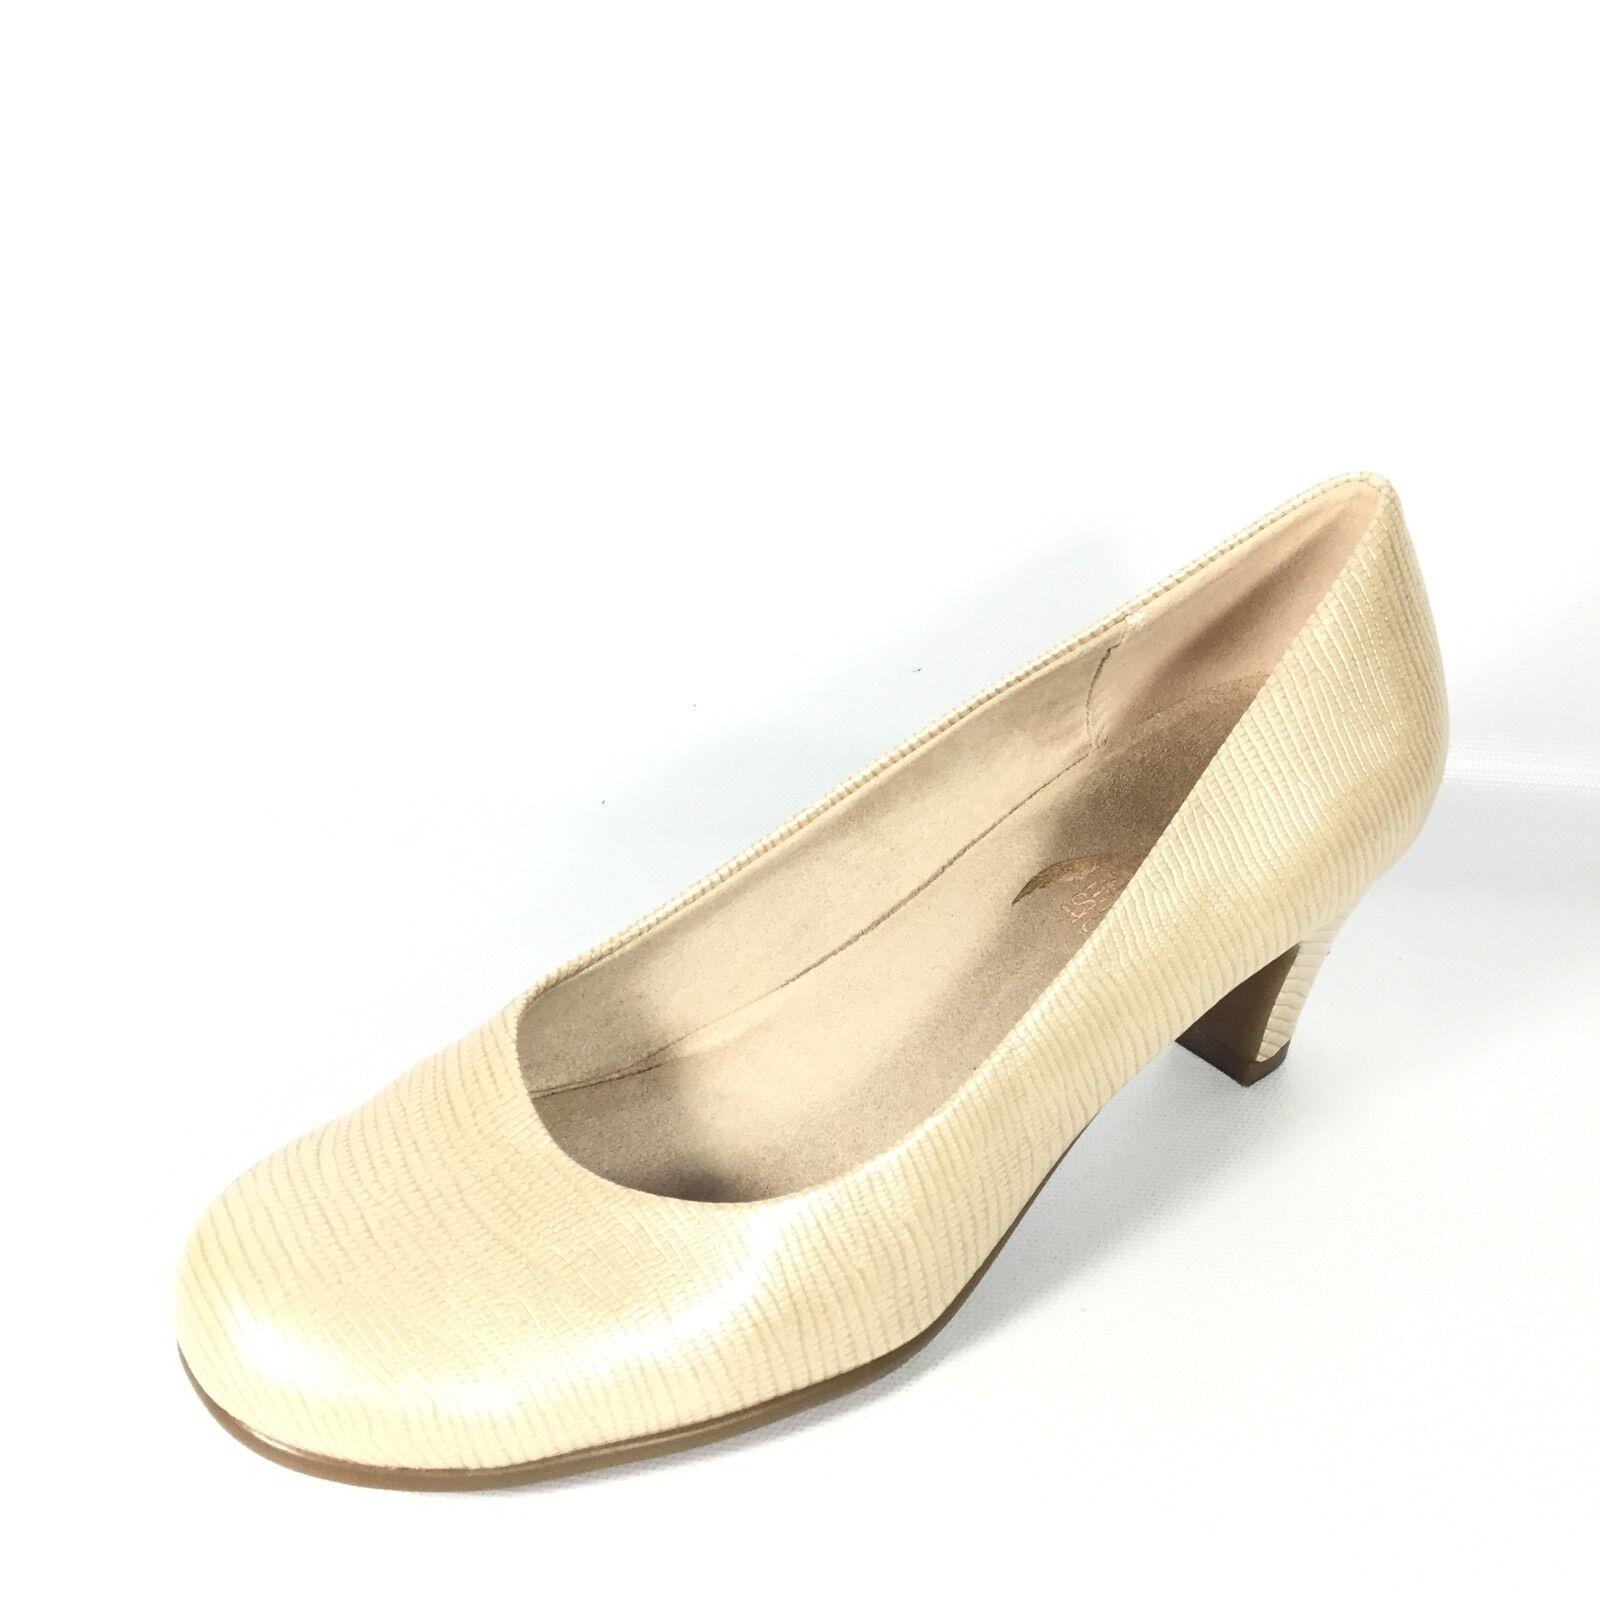 Aerosoles Nice Play Women's Size 7.5 Nude Lizar Heel Pump shoes.